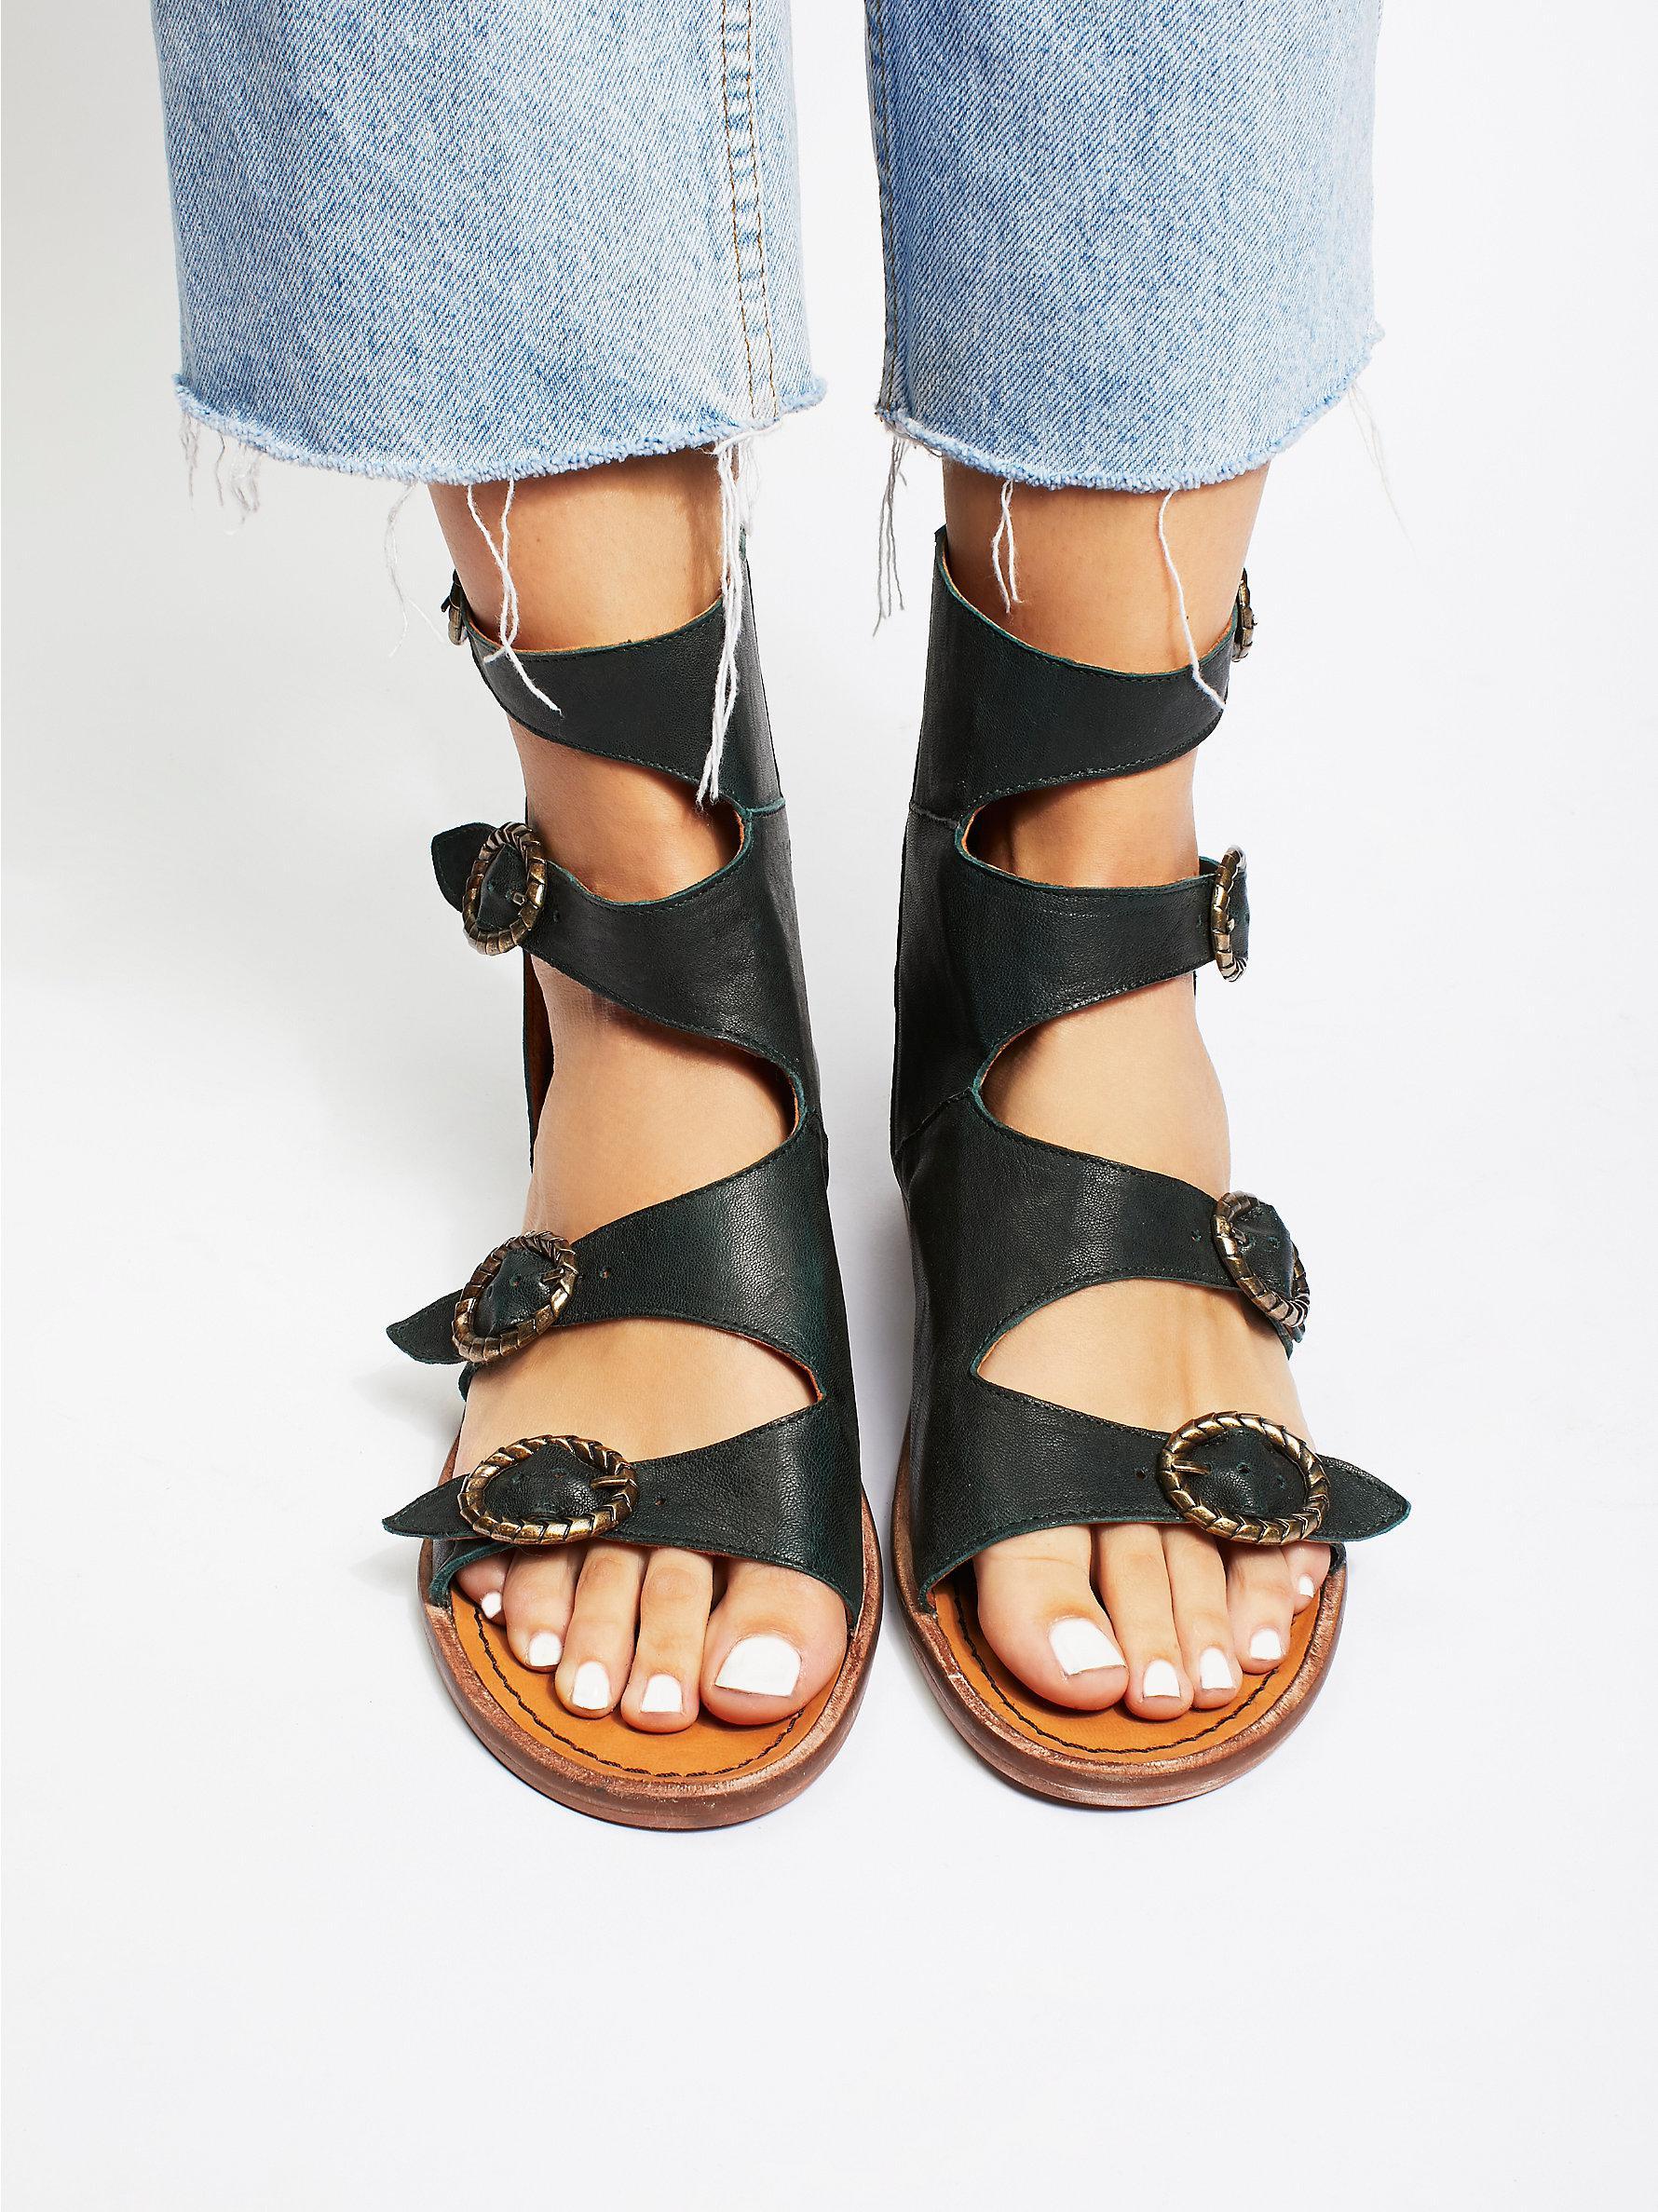 9c1a0ecd1 Lyst - Free People Ludlow Boot Sandal in Black